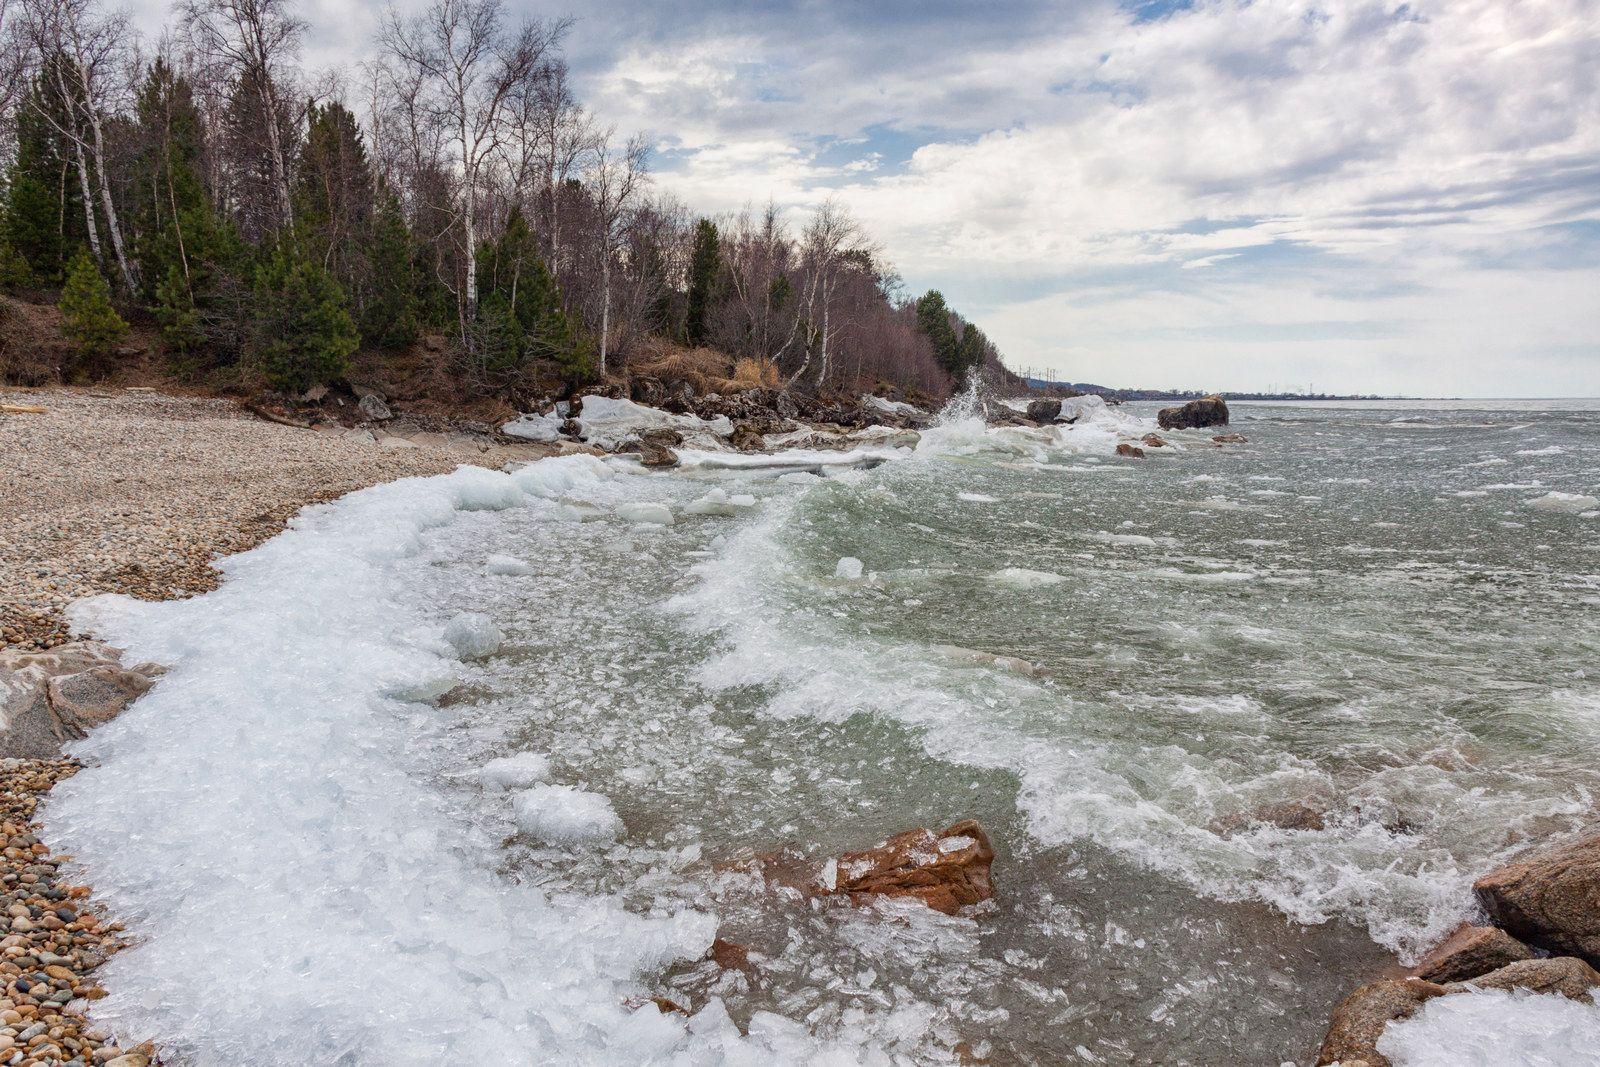 Шуга на Байкале Байкал красота Россия Бурятия экология весна